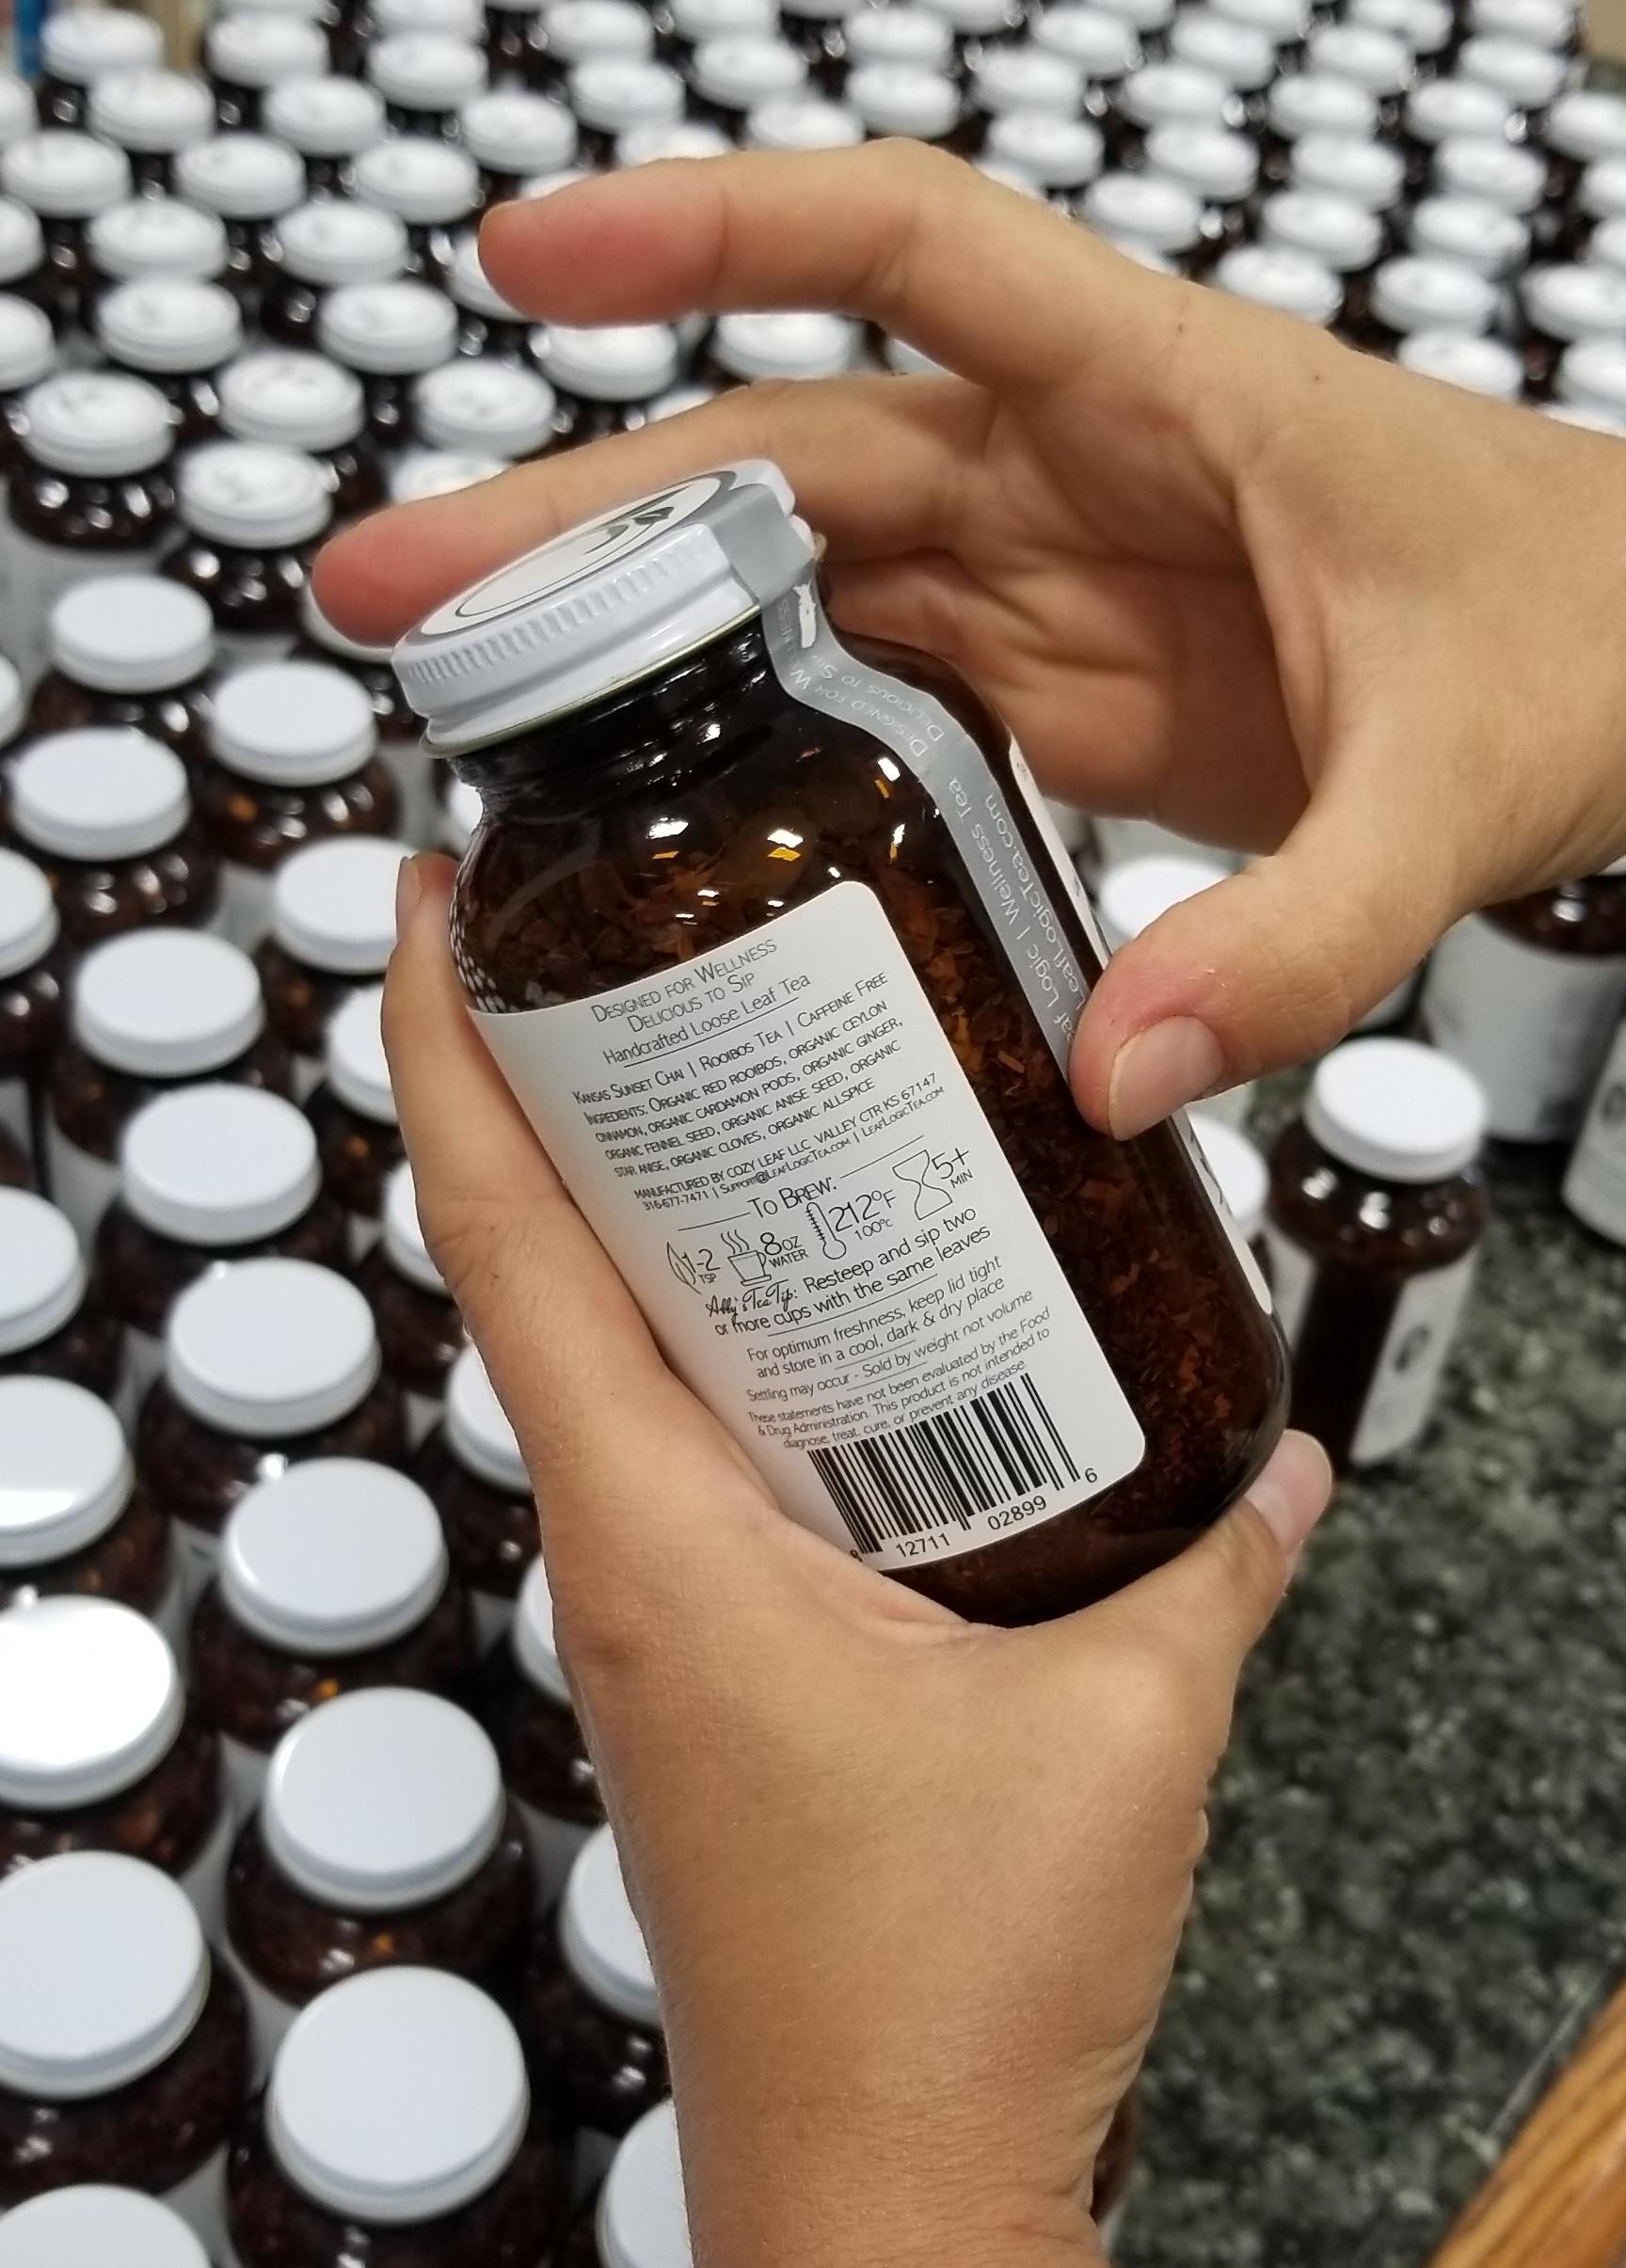 Leaf Logic Jar Packaging by hand.jpg